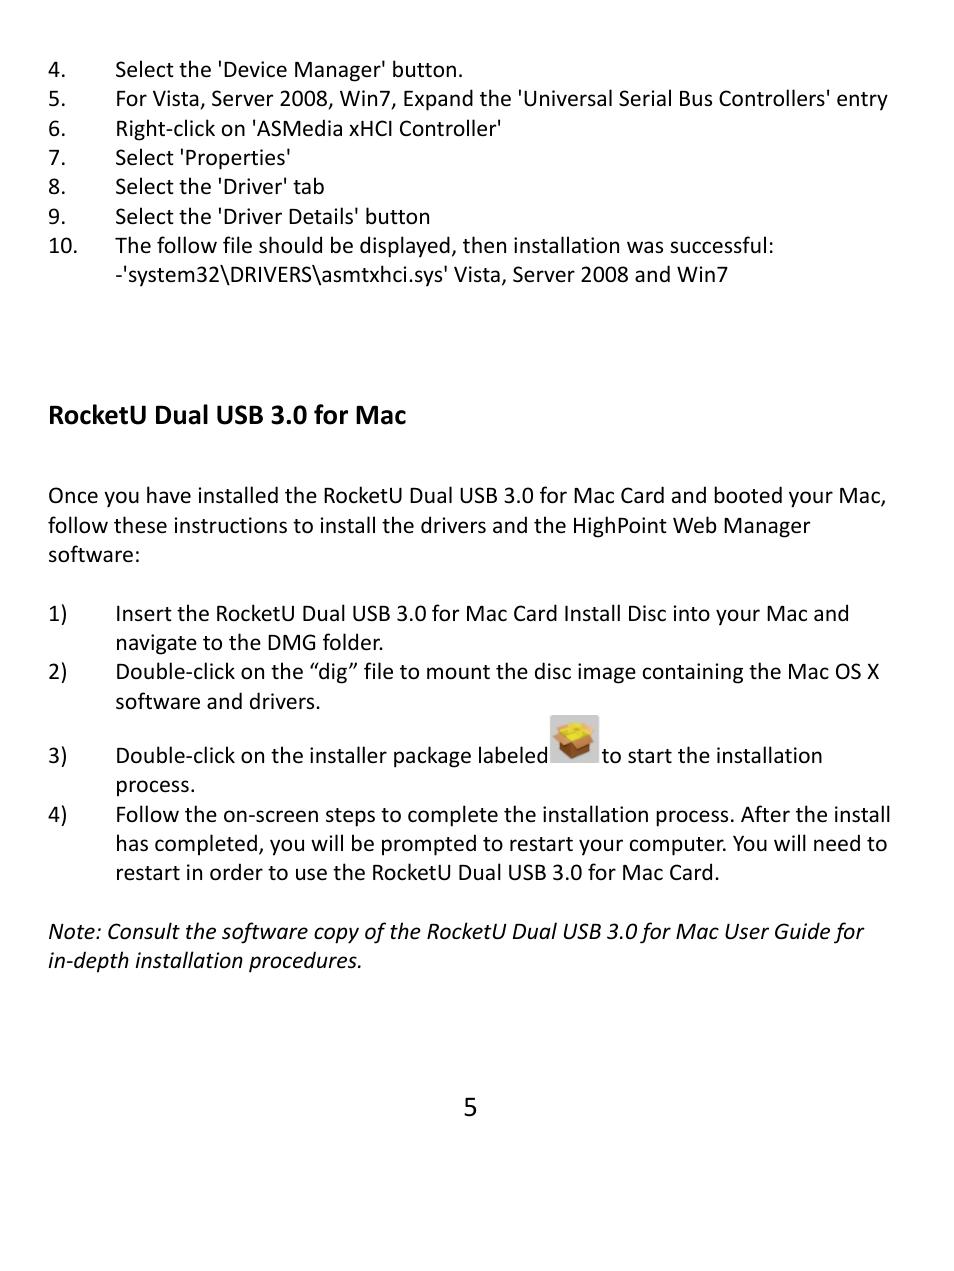 Rocketu dual usb 3 0 for mac | HighPoint RocketU 1022A User Manual